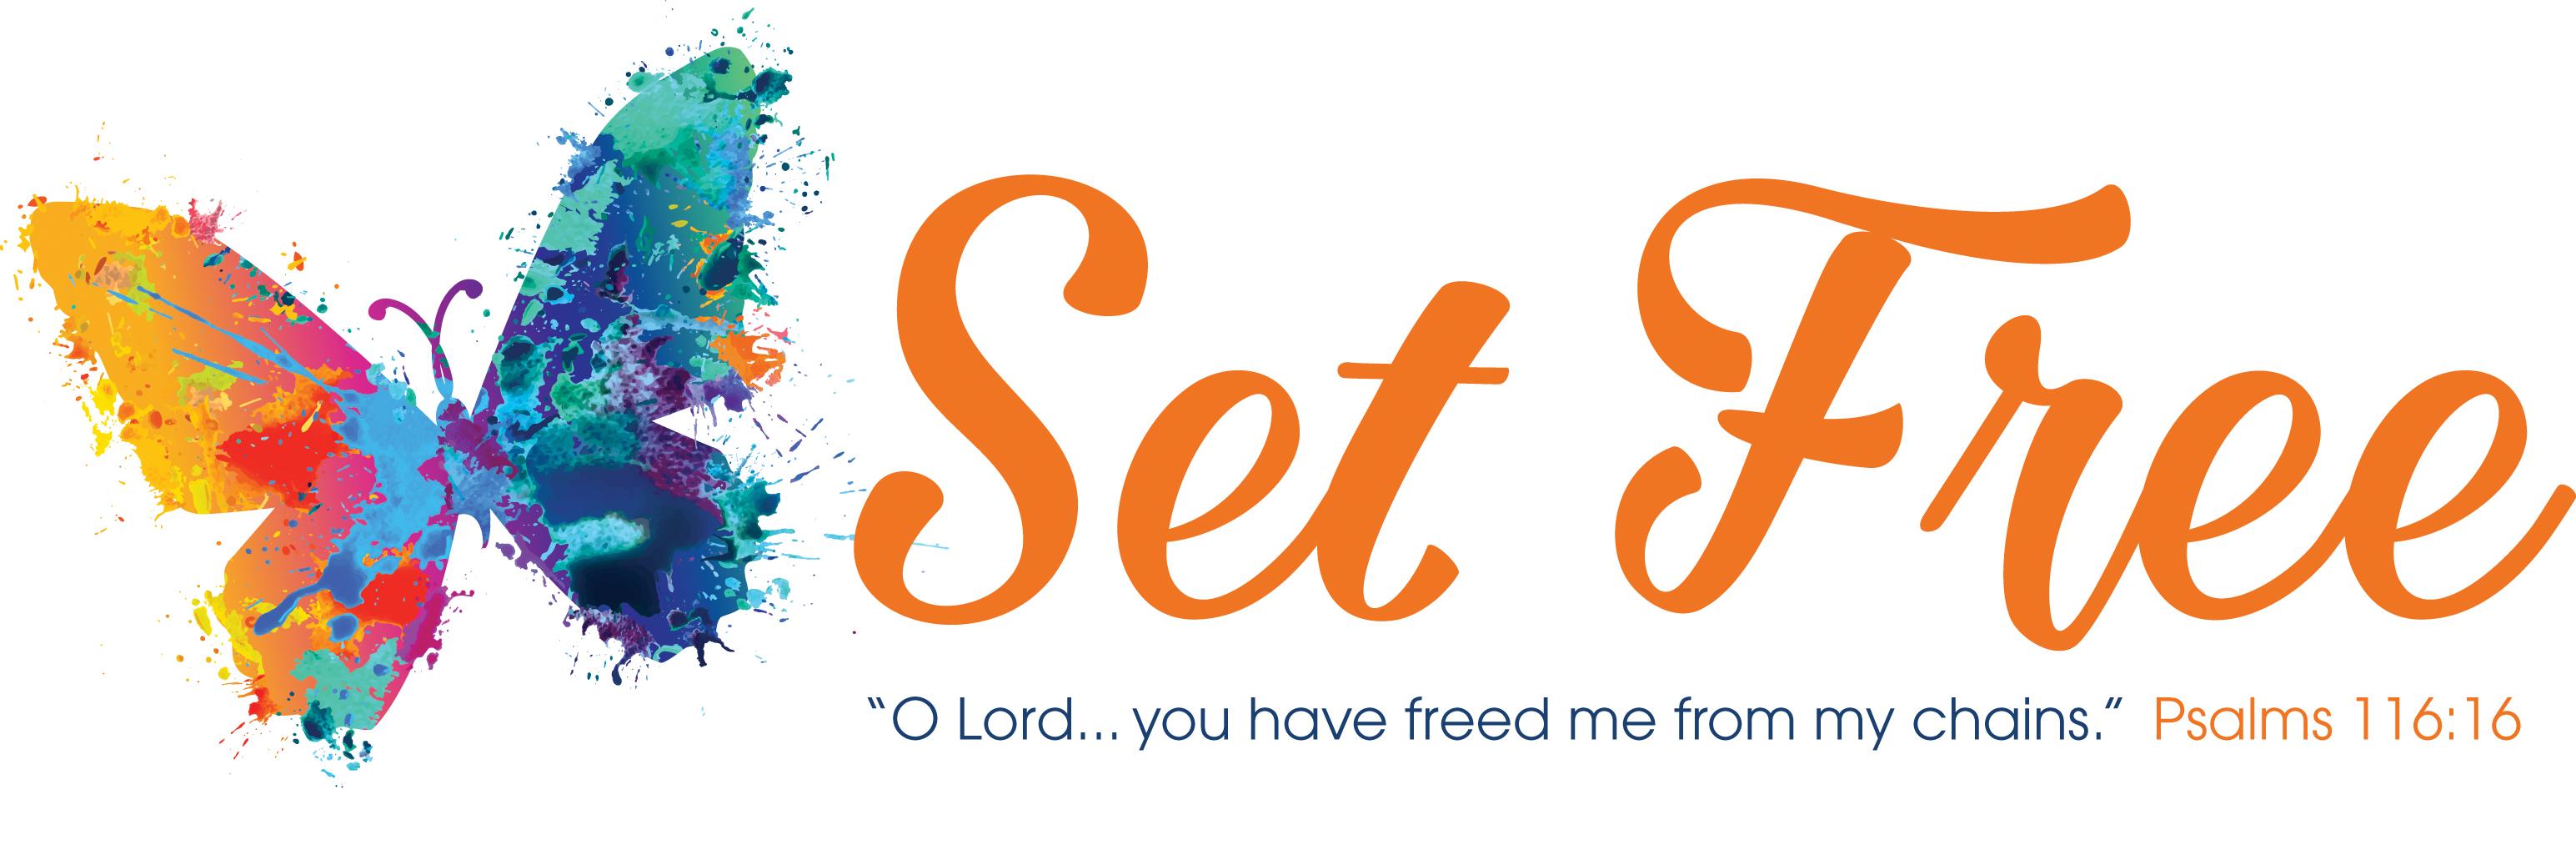 christian logo design logo design for churches